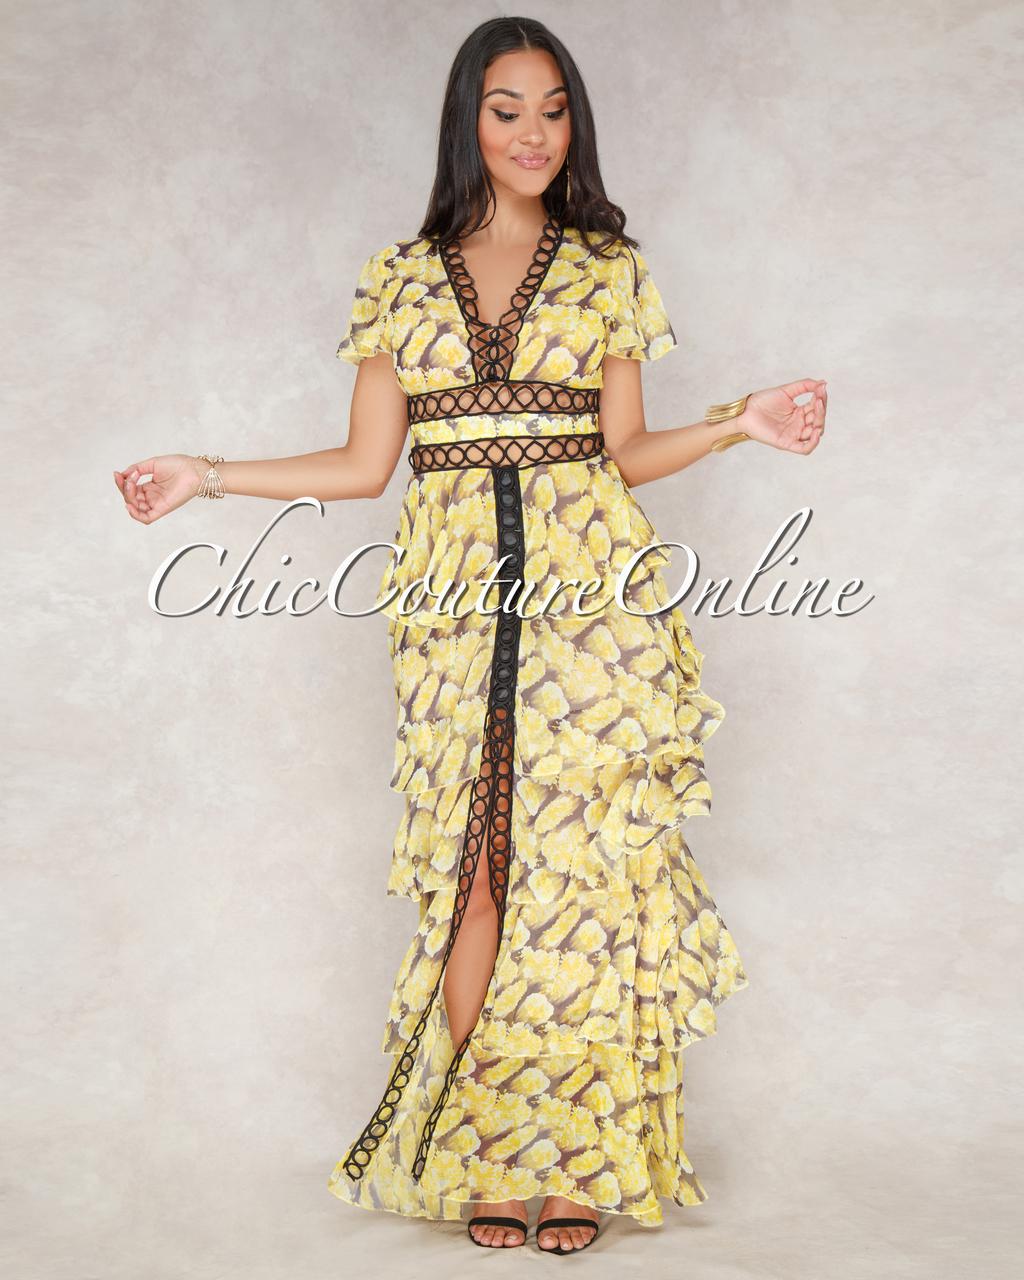 Sioban Yellow Floral Black Crochet Tier Maxi Dress